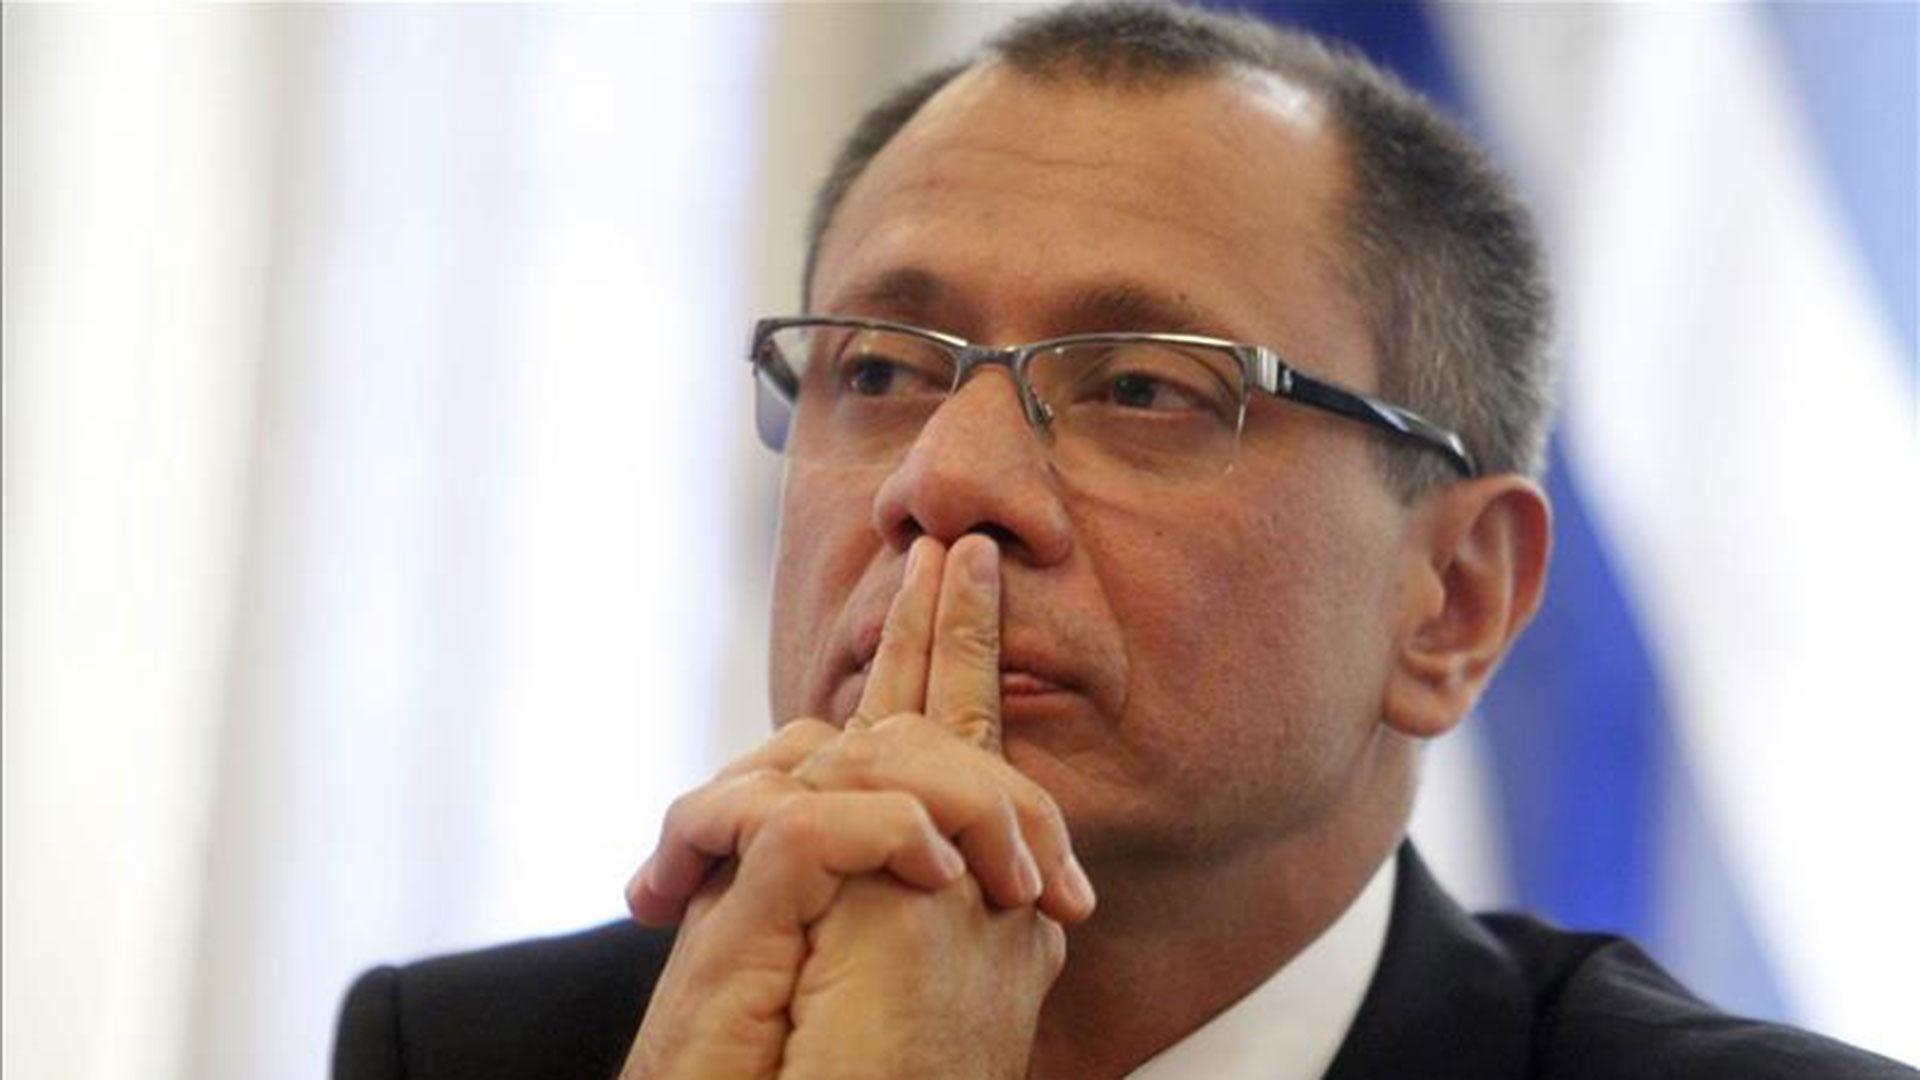 Fiscalía de Ecuador descarta acusar a cinco procesados en caso Odebrecht